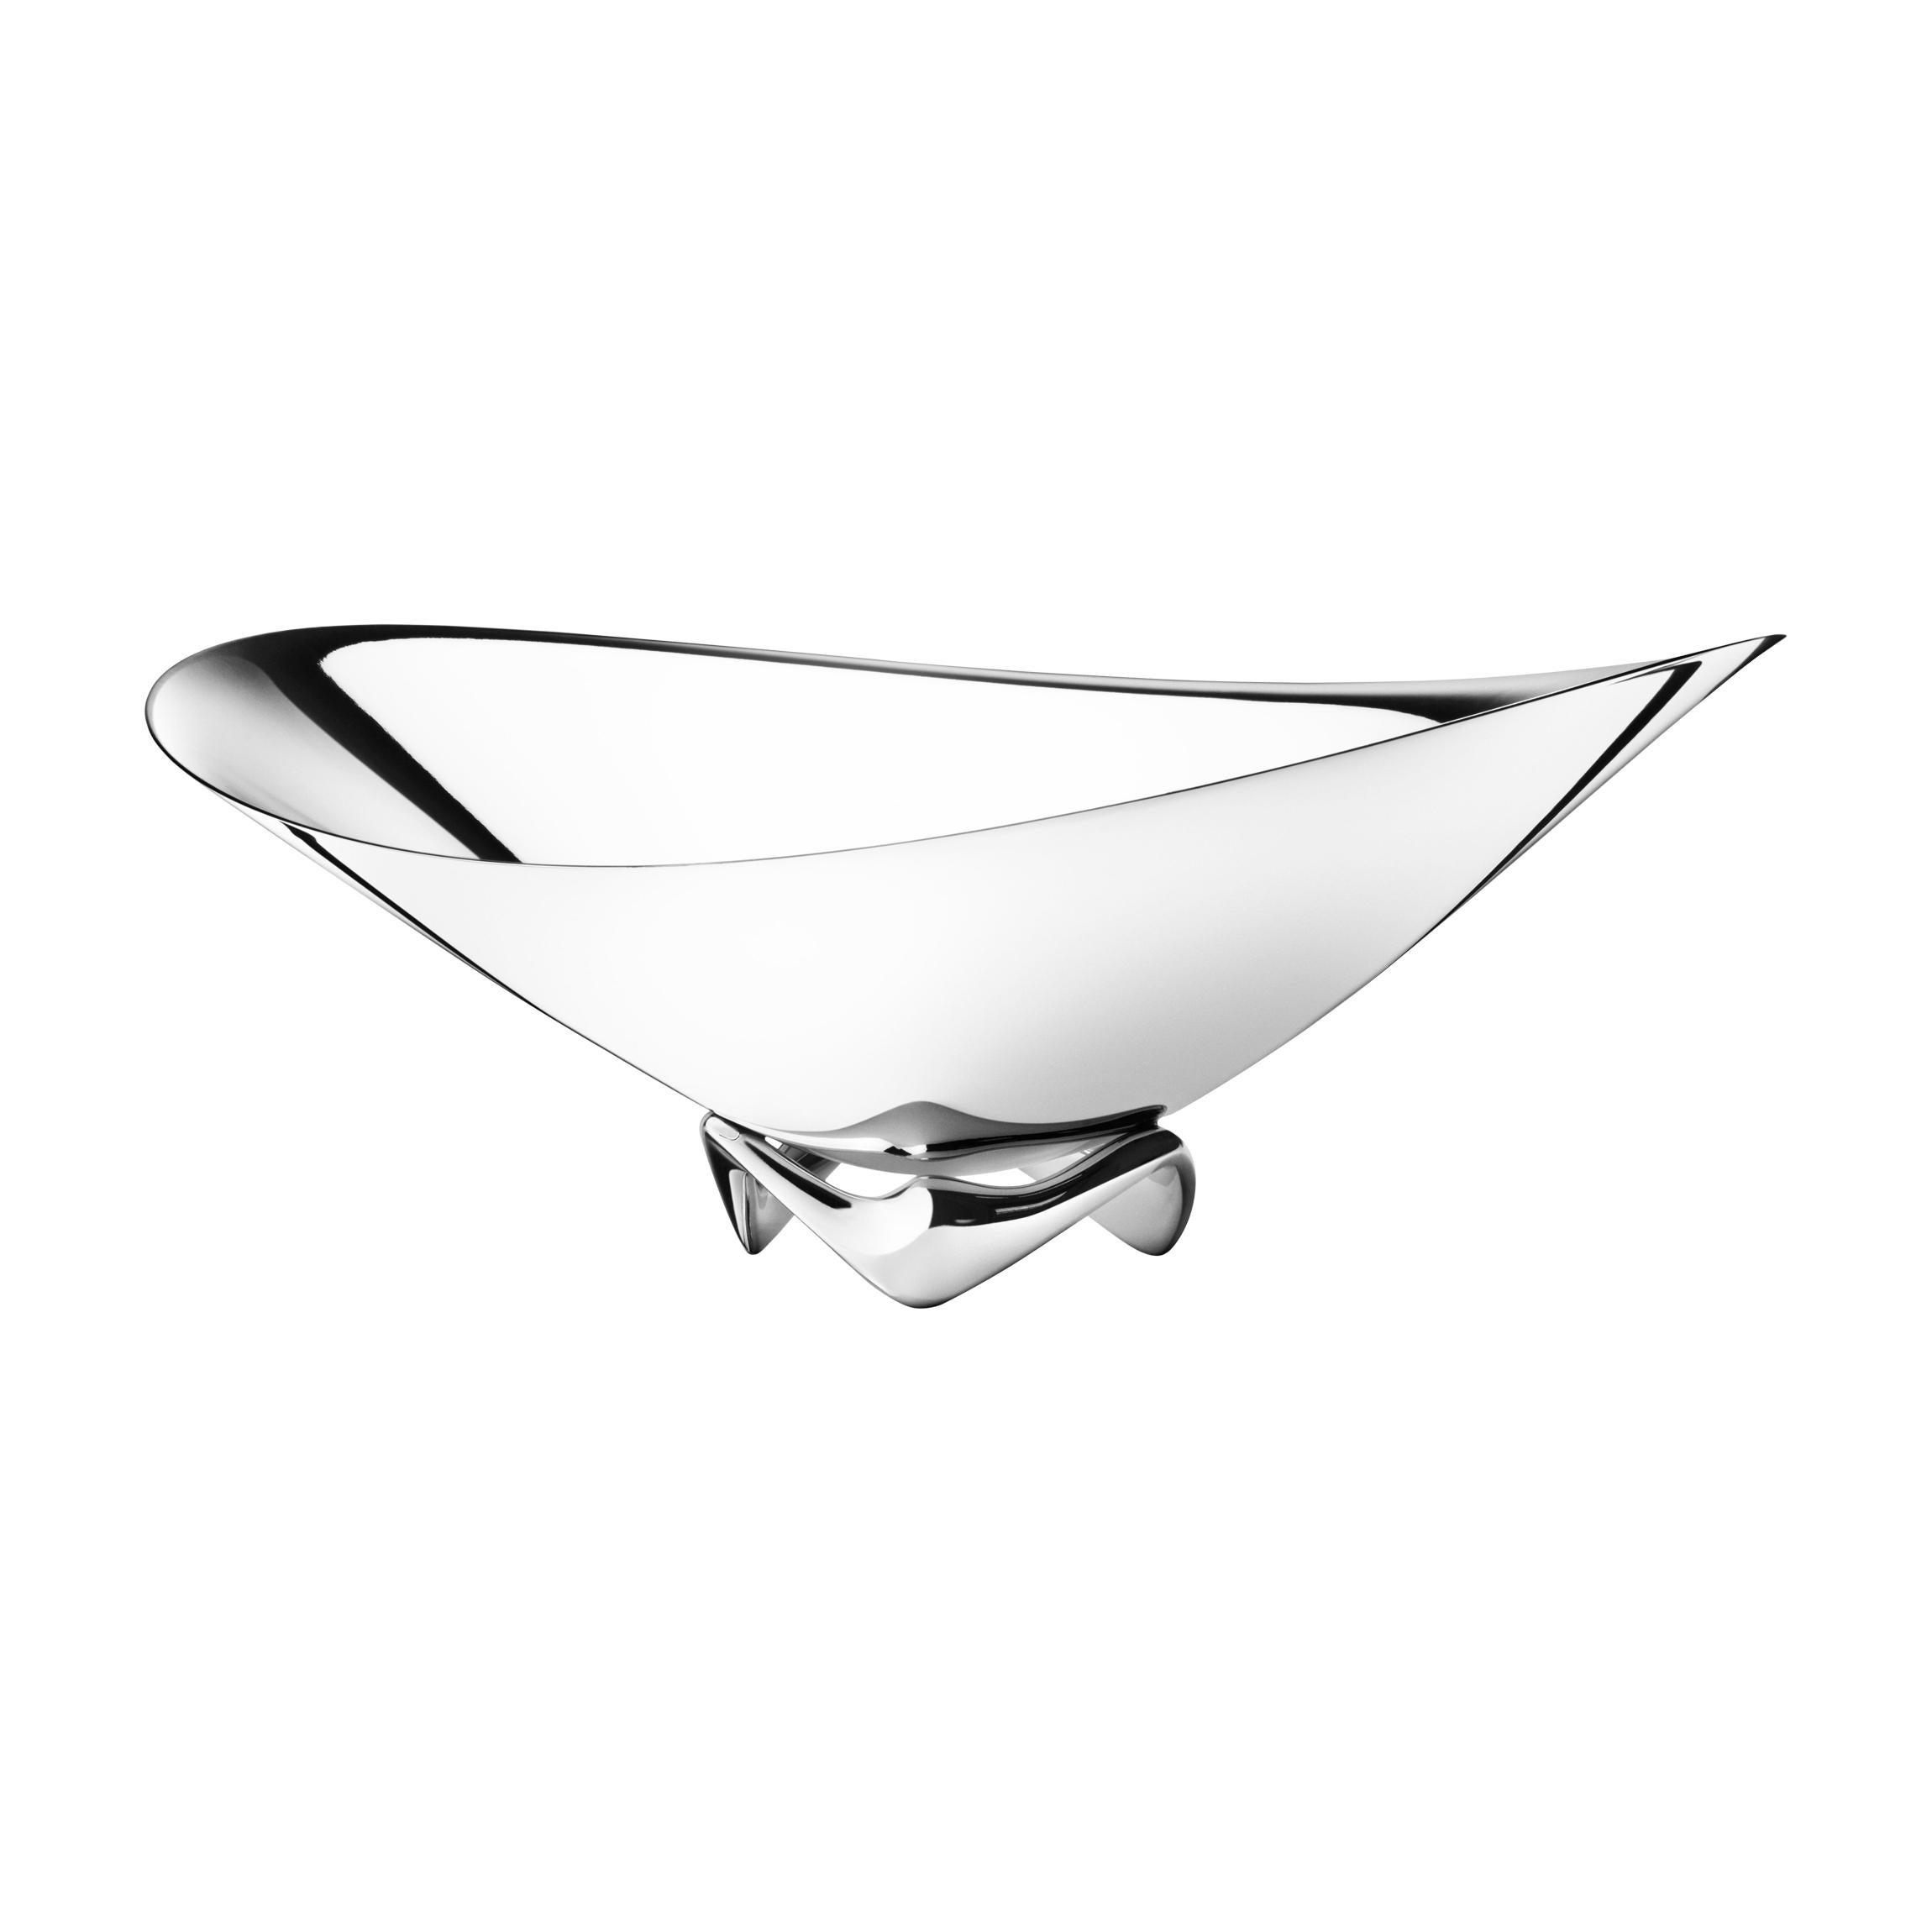 Georg Jensen HK Wave Bowl in Stainless Steel by Henning Koppel